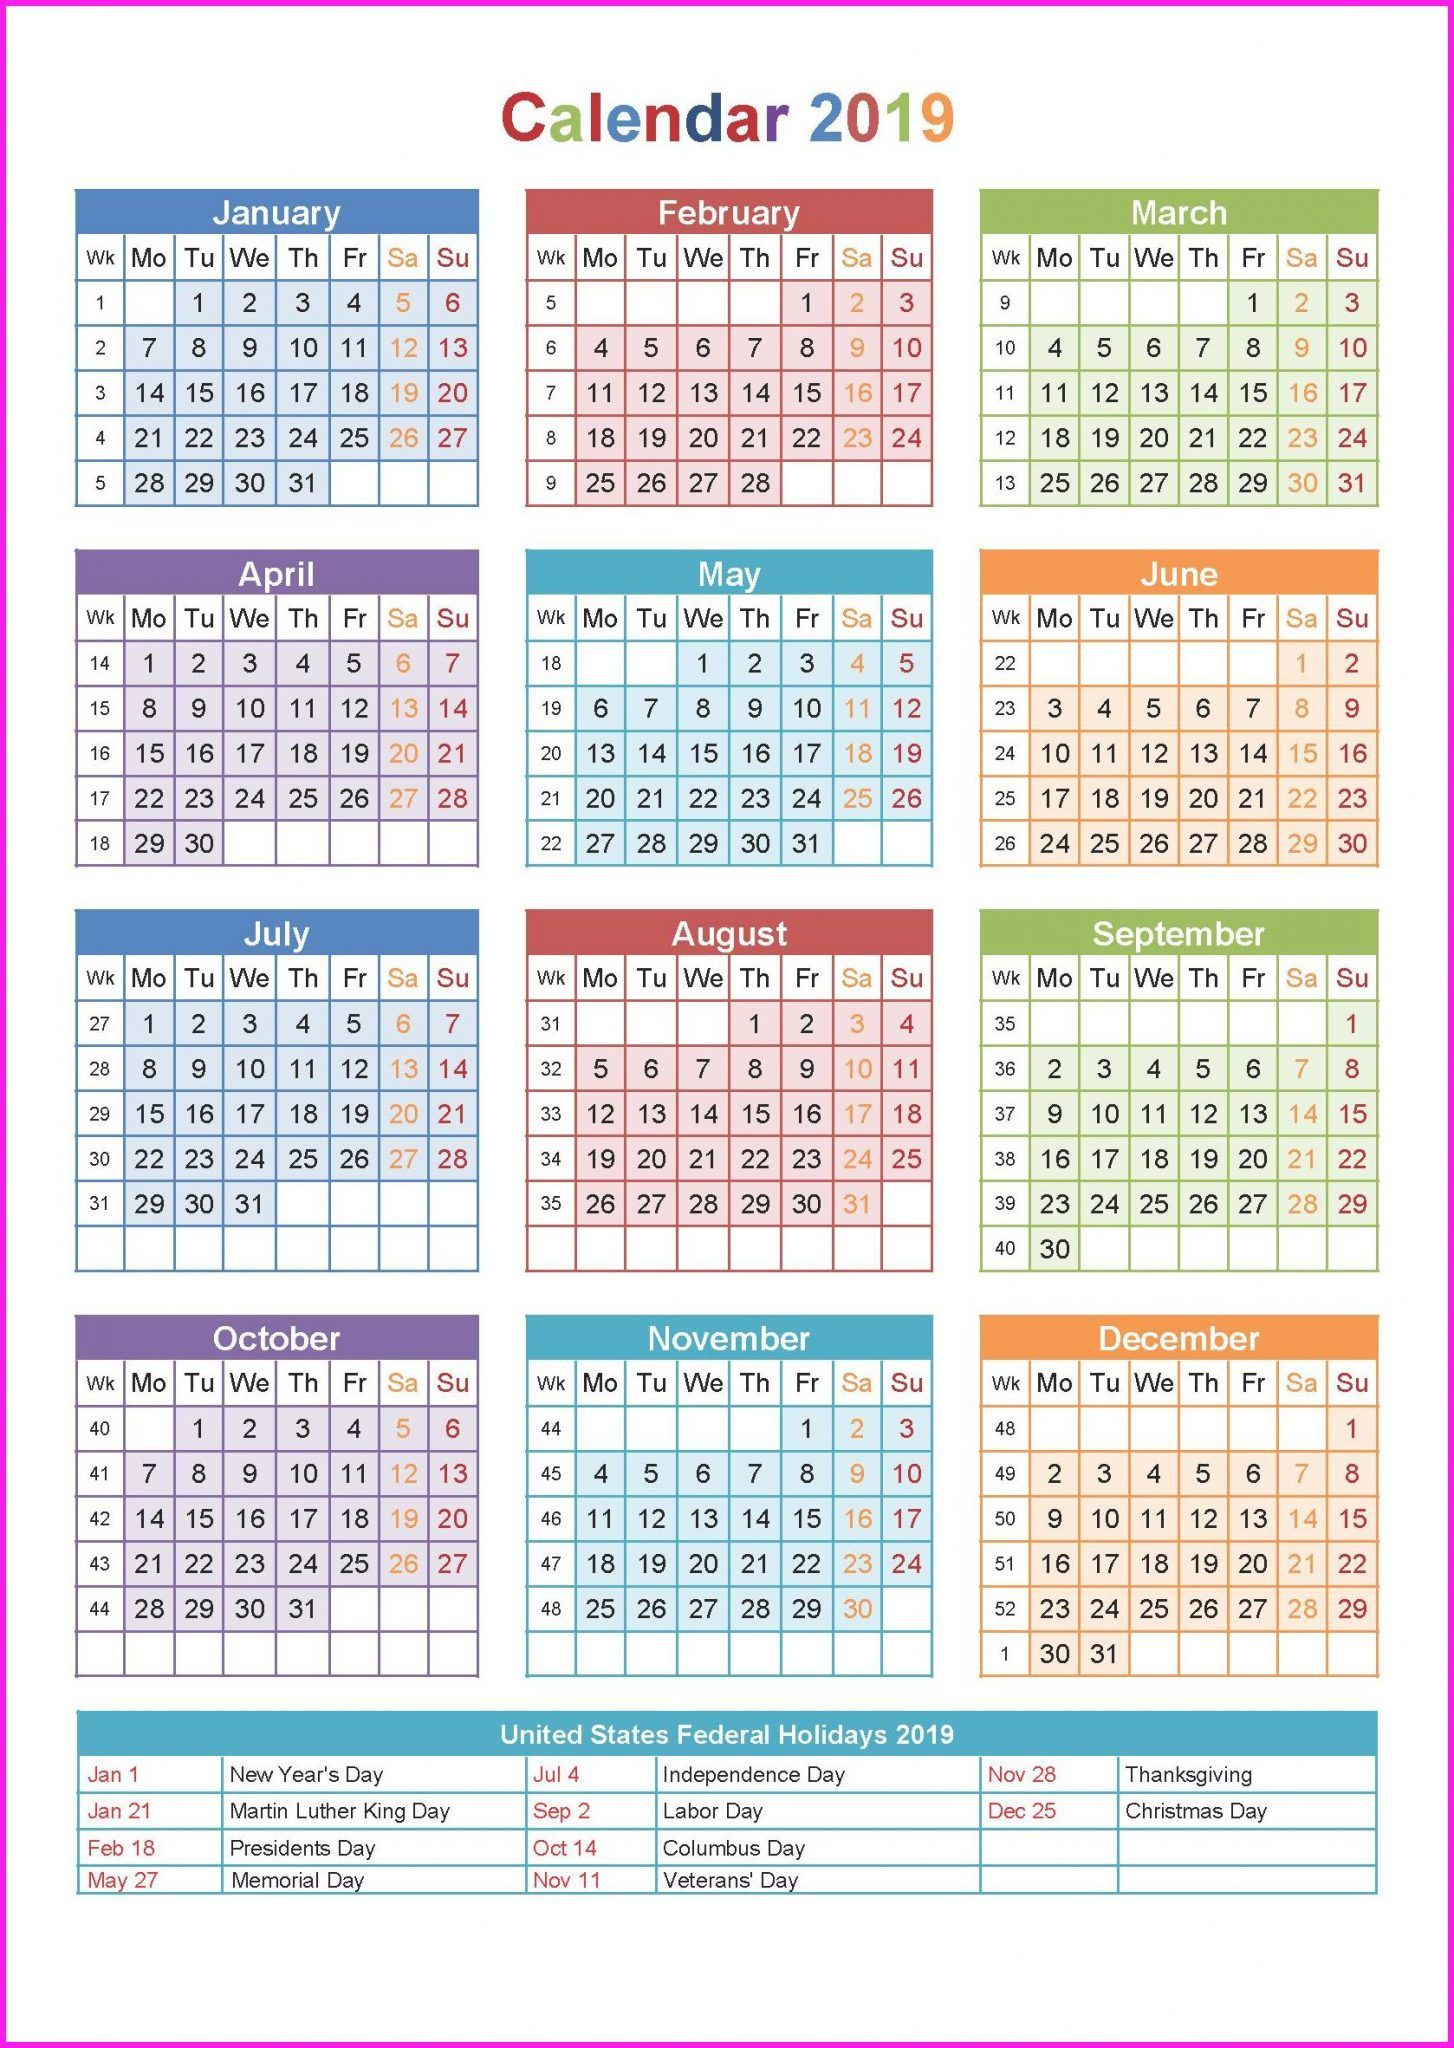 Yearly 2019 Calendar Printable | Top 10 Free 2019 Calendar Printable inside Calendar October 2019 Nsw Printable